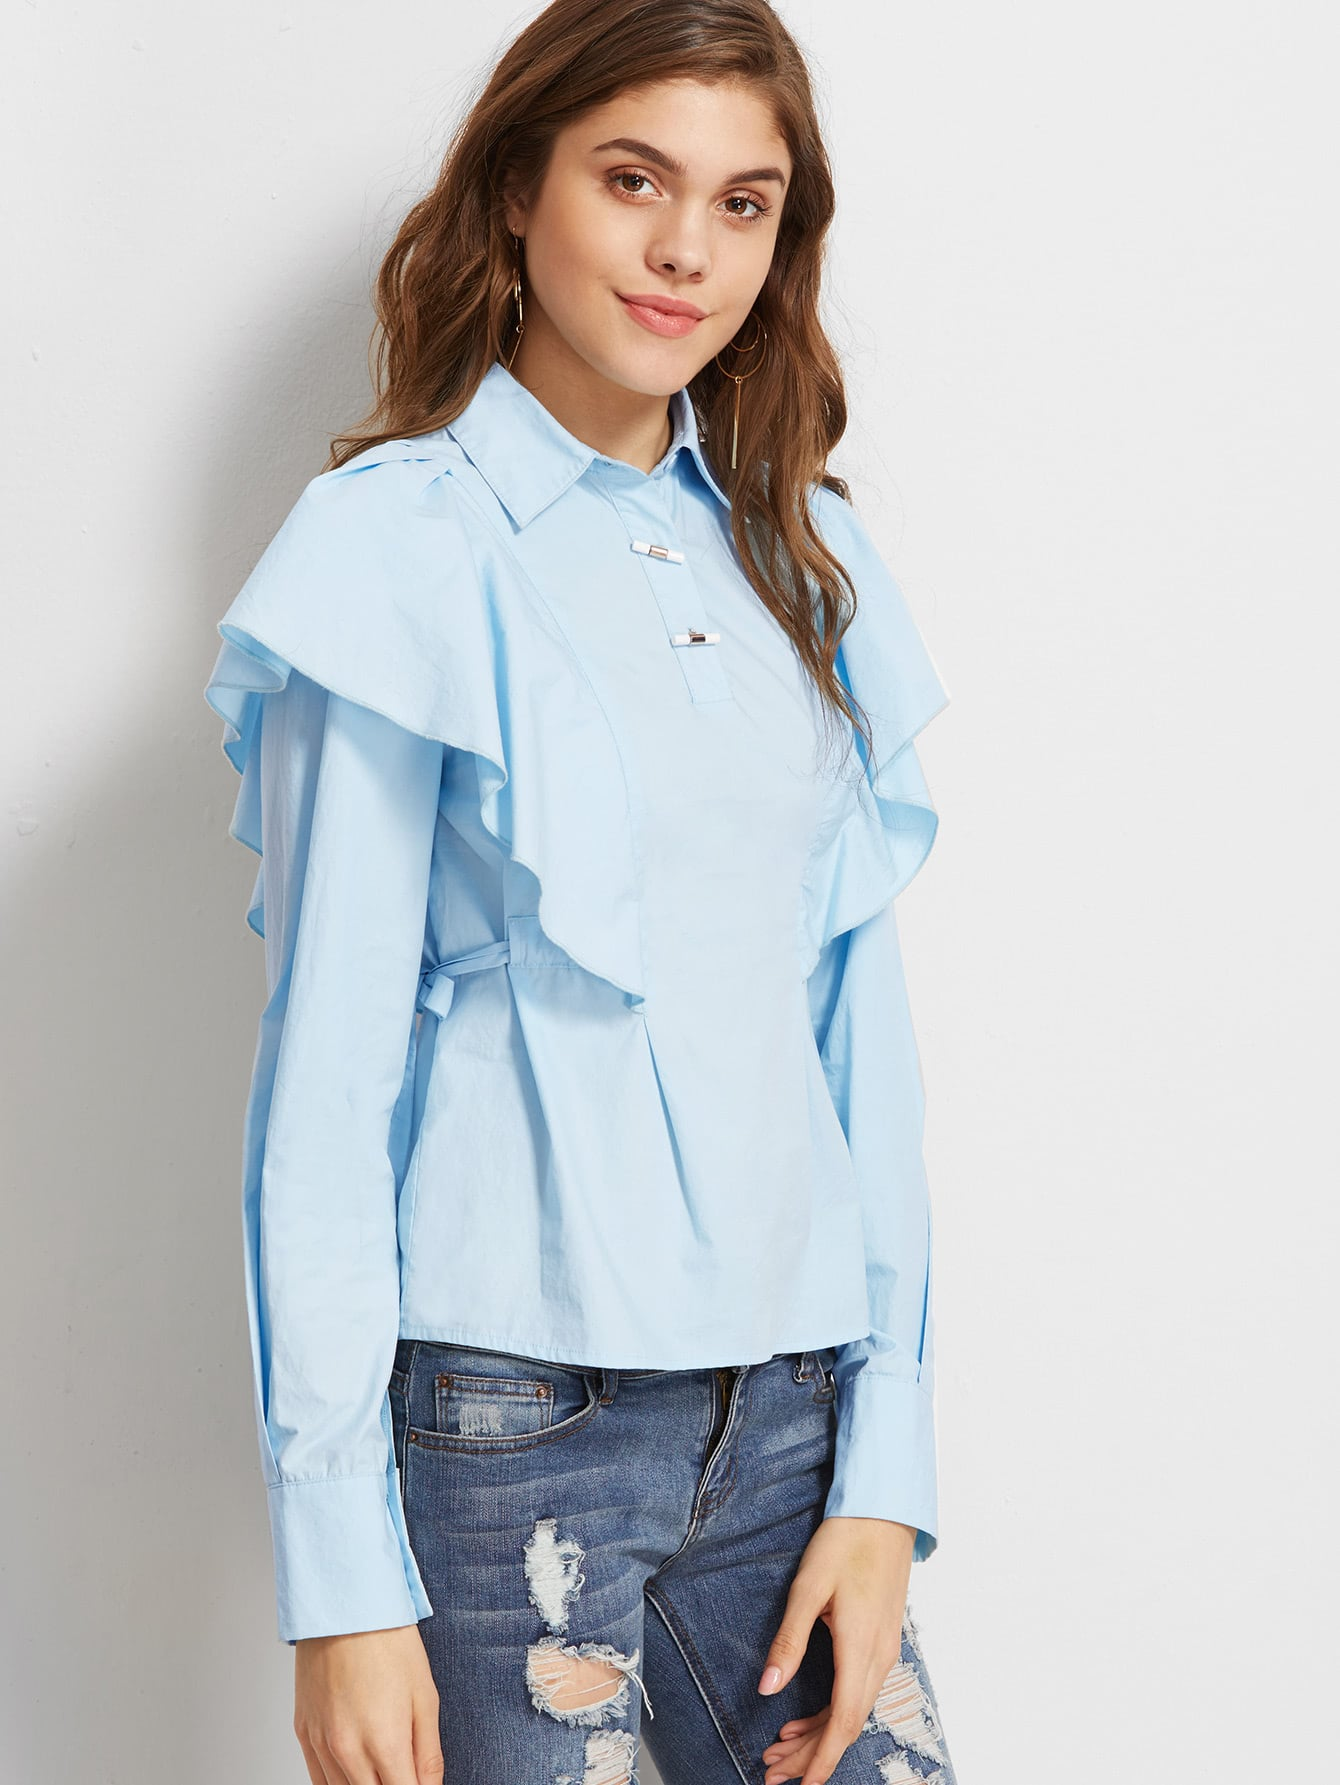 blouse161027703_1